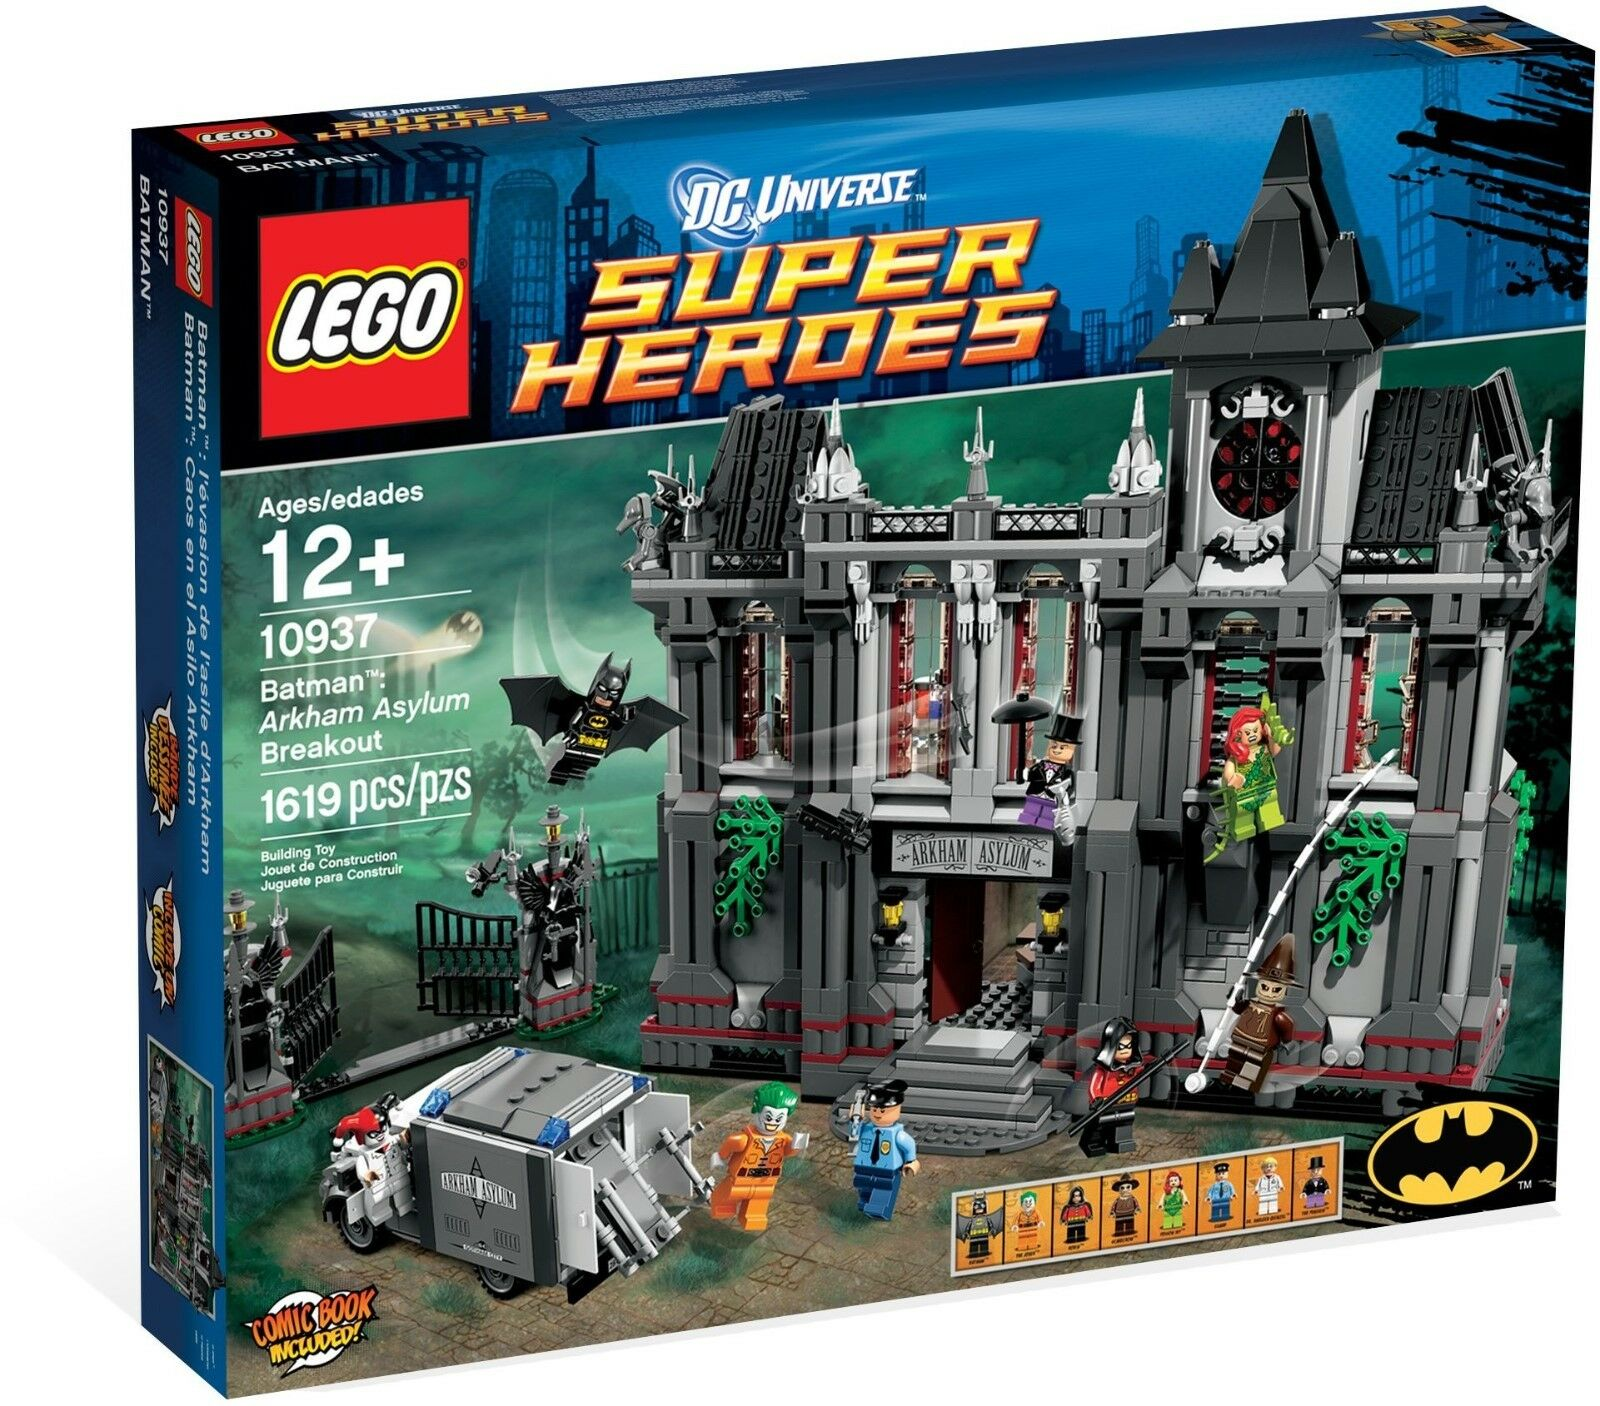 LEGO Super Heroes Batman  Arkham Asylum Breakout 10937 - Brand New - Retired